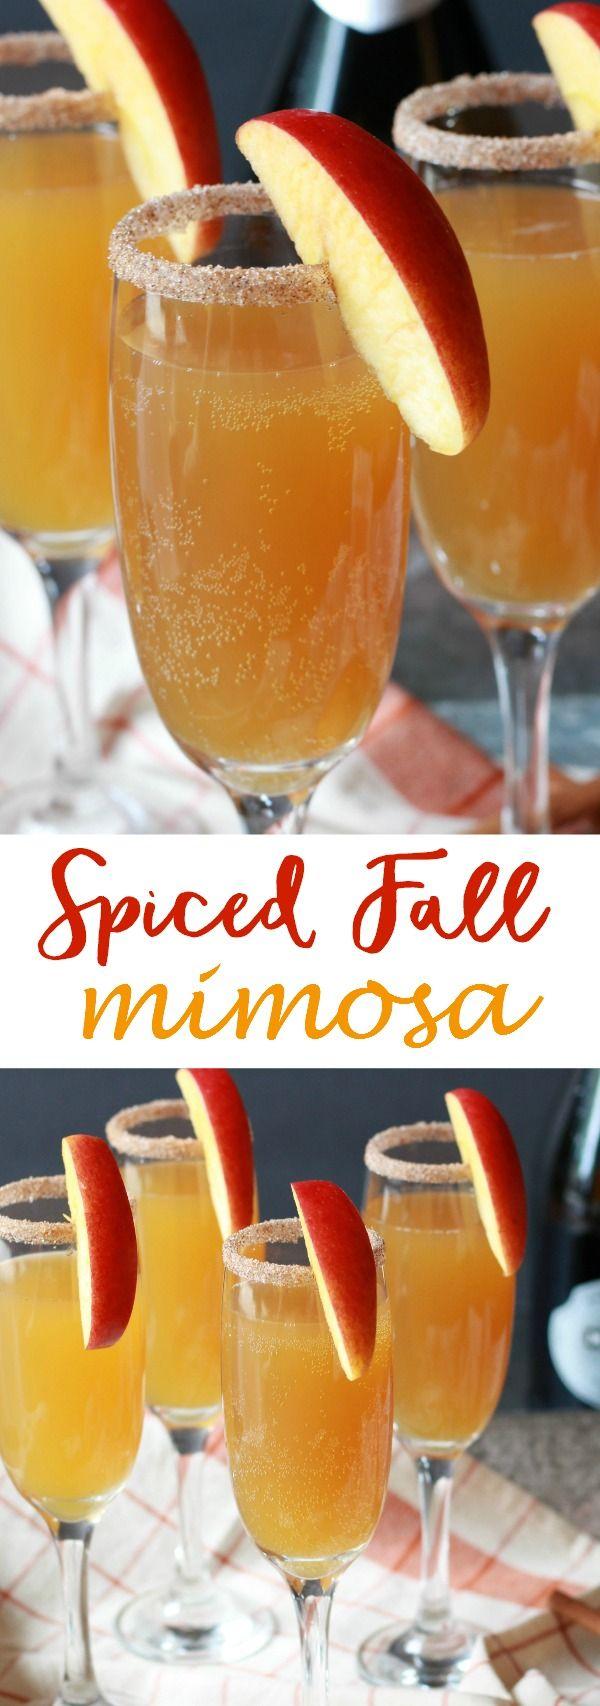 Spiced Fall Mimosa - The Lucky Pear